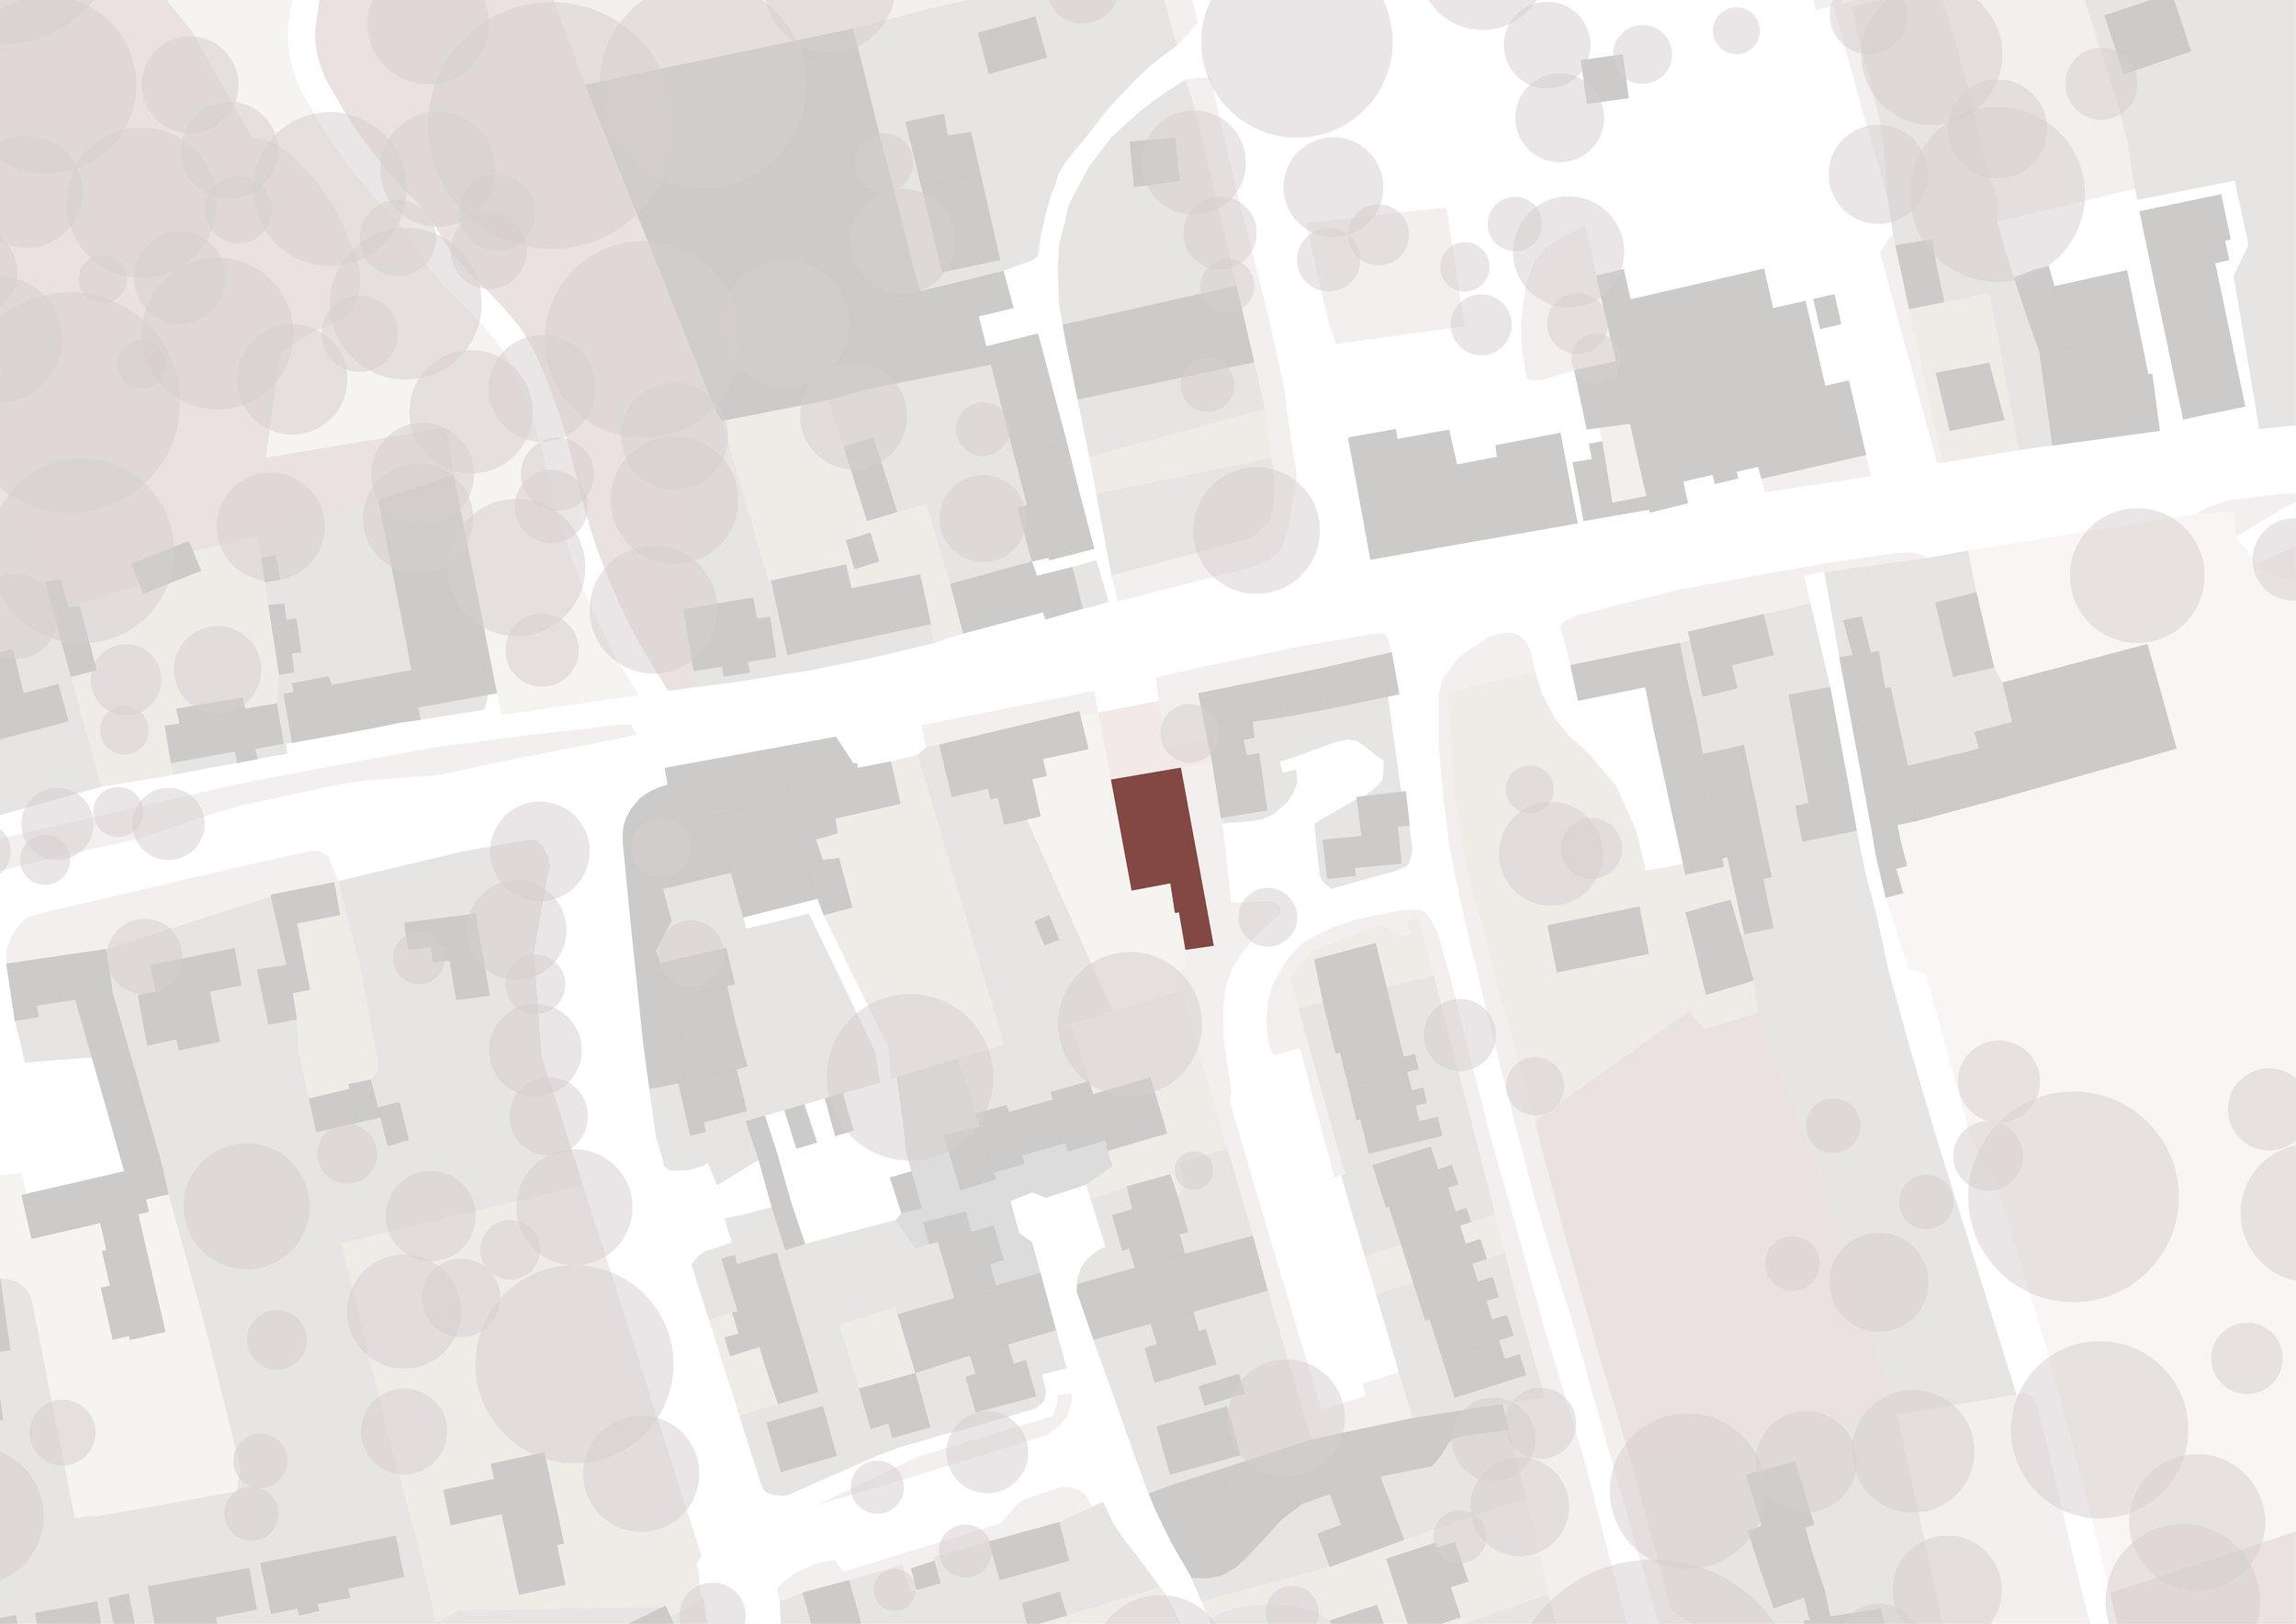 Walkington Methodist Chapel Map - East Yorkshire Architects - Samuel Kendall Associates